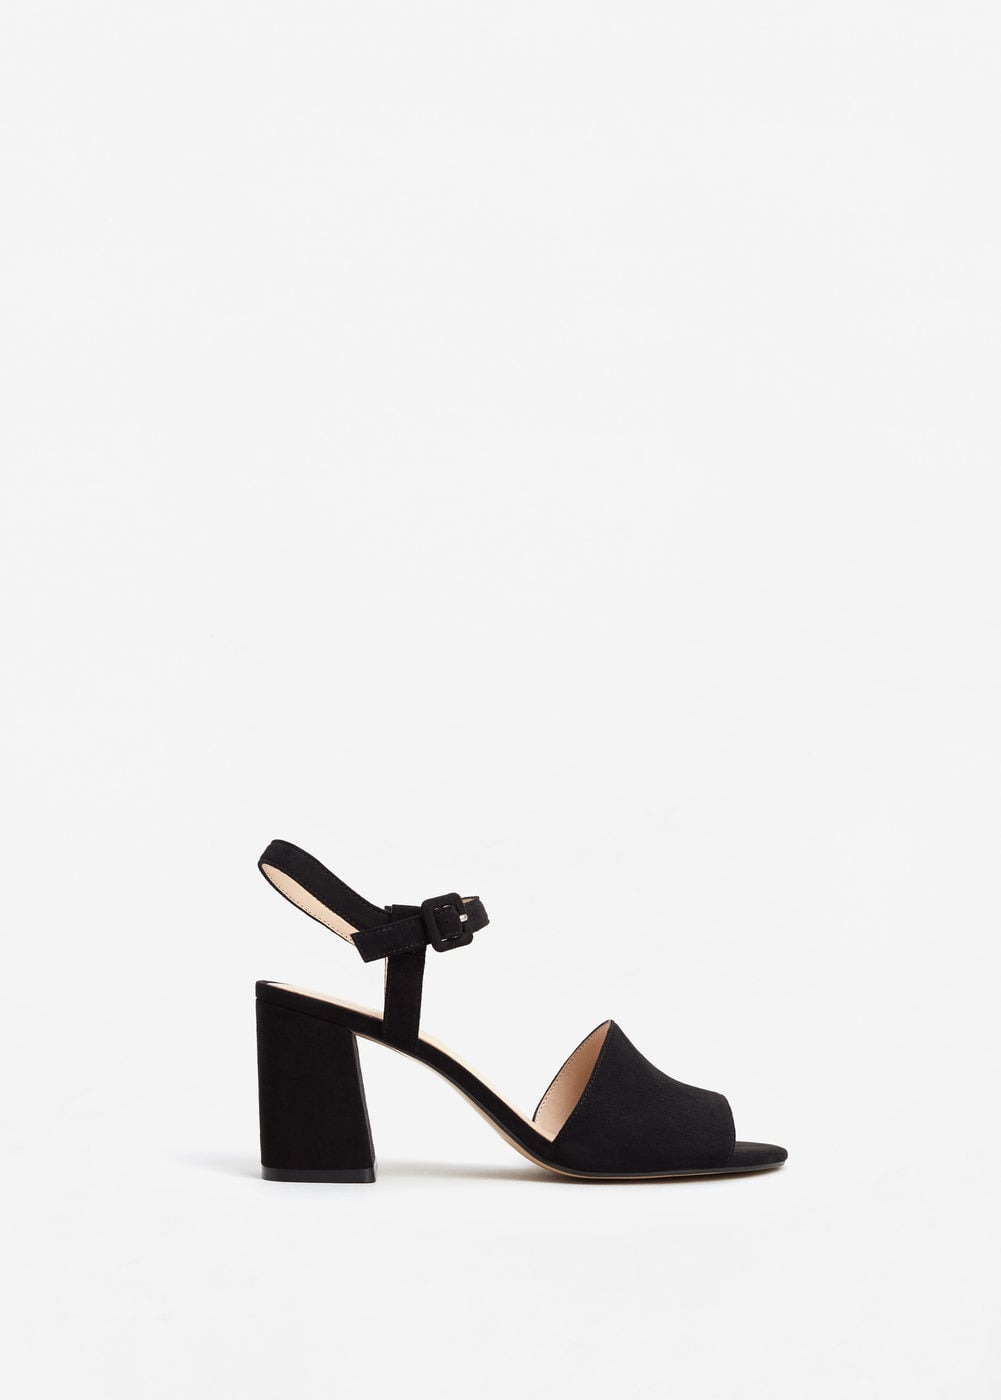 Mango Ankle- Cuff sandals $59.99